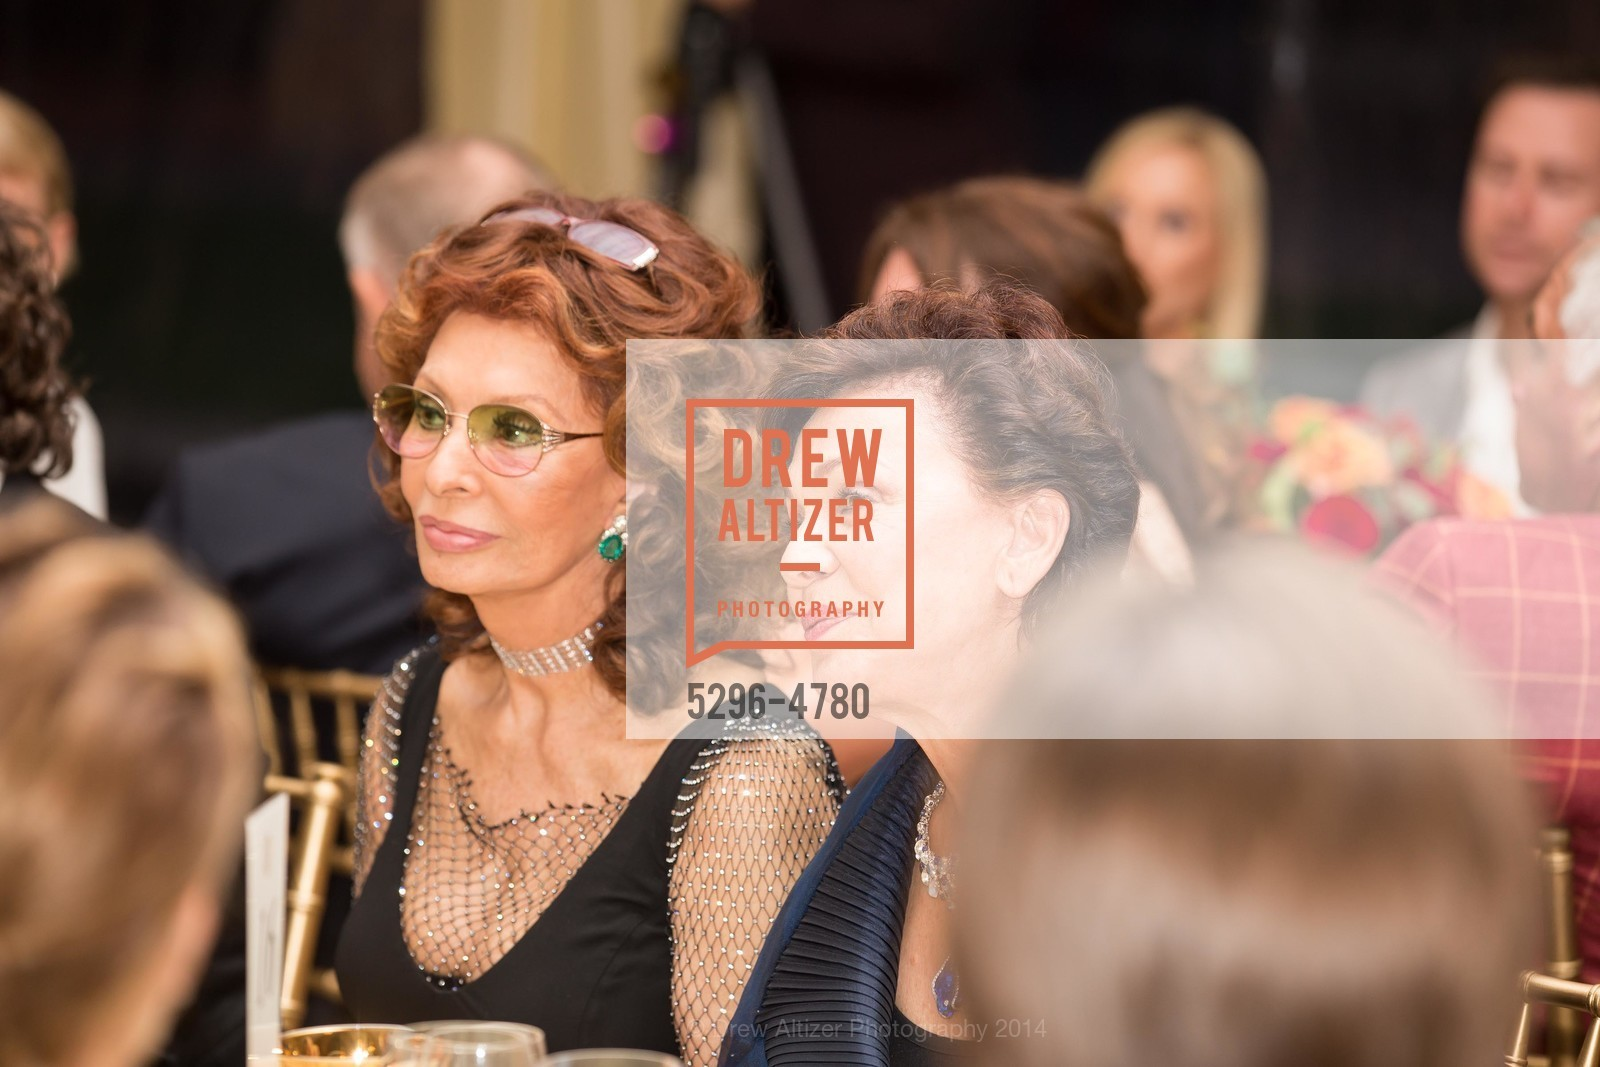 Sophia Loren, Maria Manetti Shrem, Photo #5296-4780